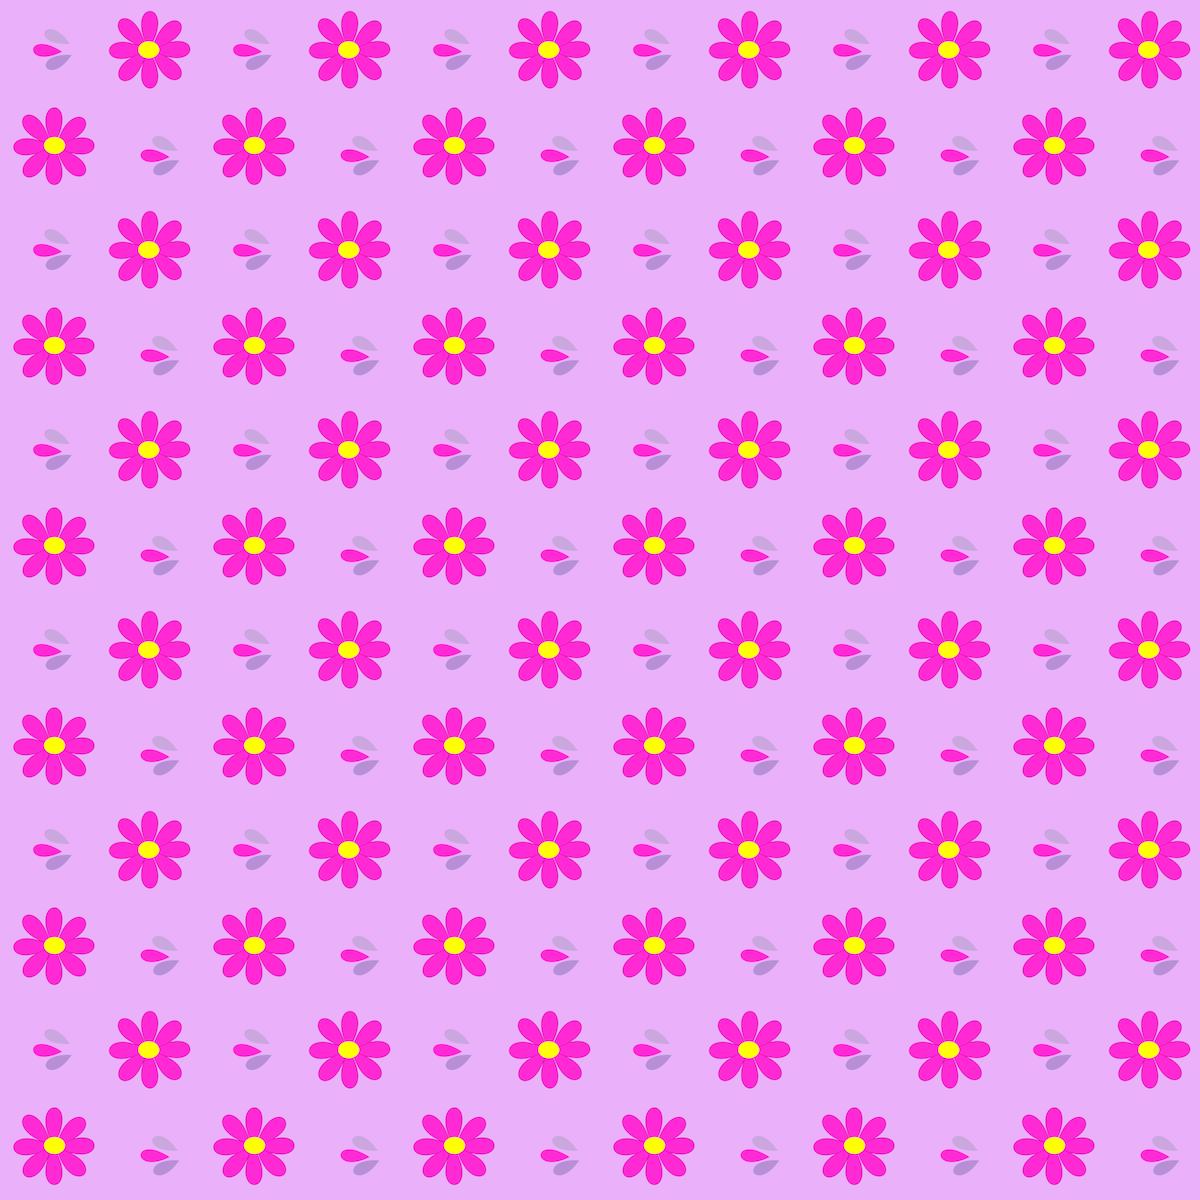 http://4.bp.blogspot.com/-7QdZKCqMYEY/UxTQk_C5K2I/AAAAAAAAcYw/-3Umzs2bmyE/s1600/Lilac_Daisy_Paper.png